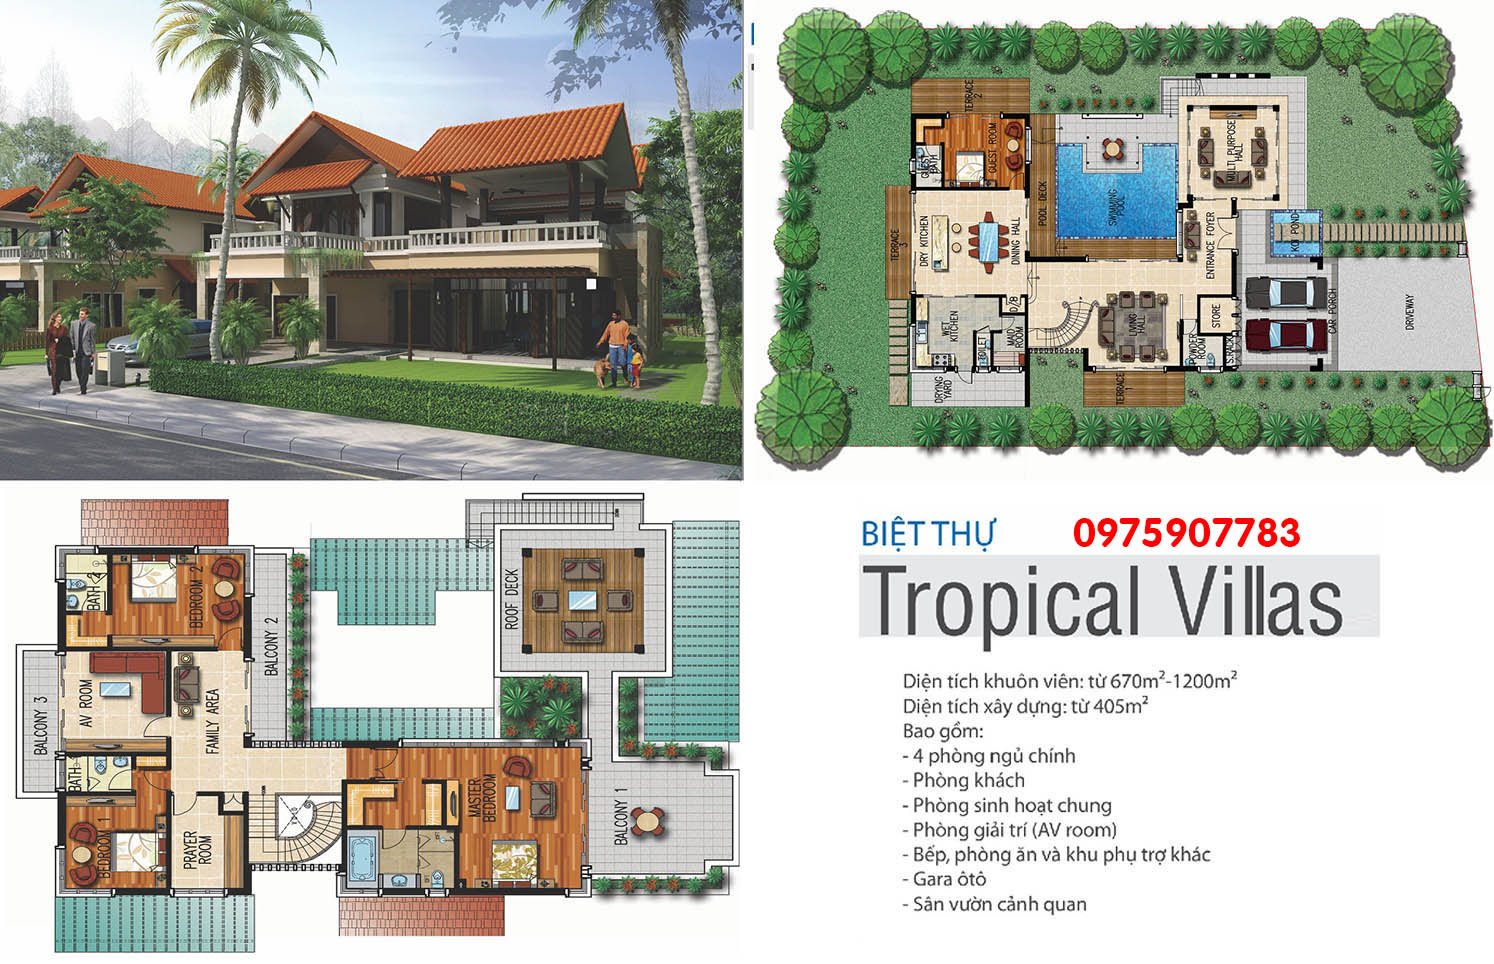 Xanh Villas - biệt thự Tropical